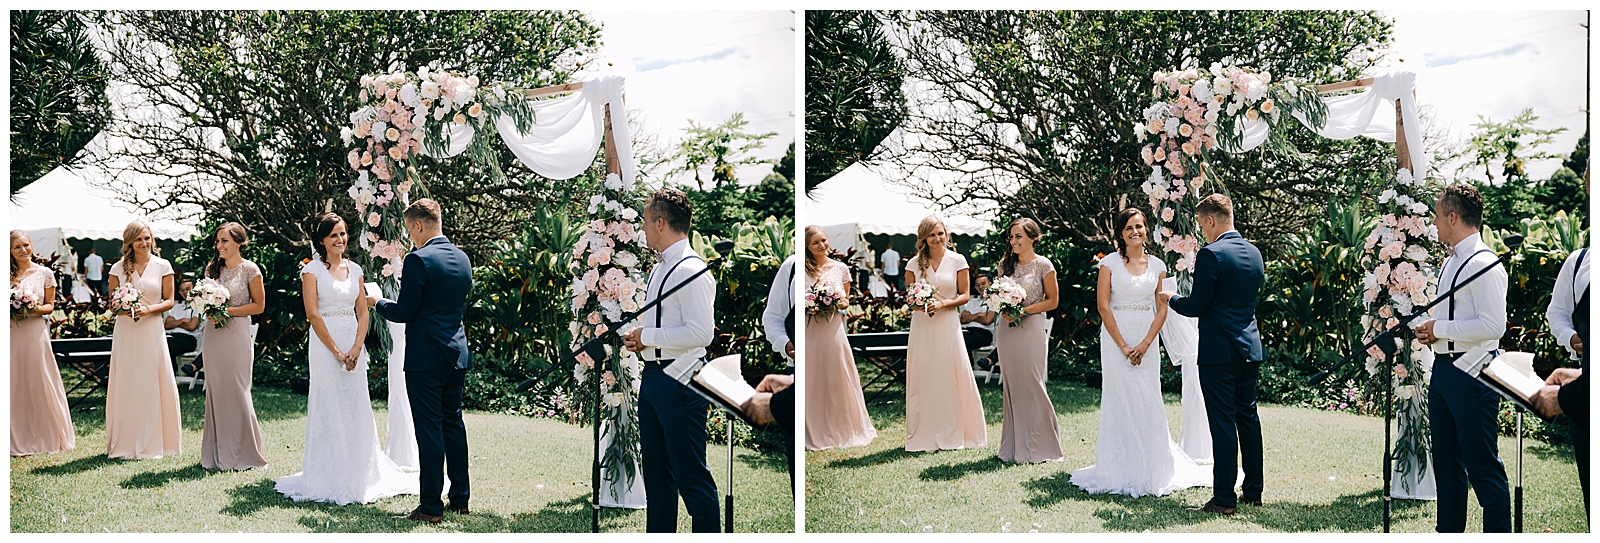 Hawaii Destination Wedding Annie Zav Photography_0036.jpg